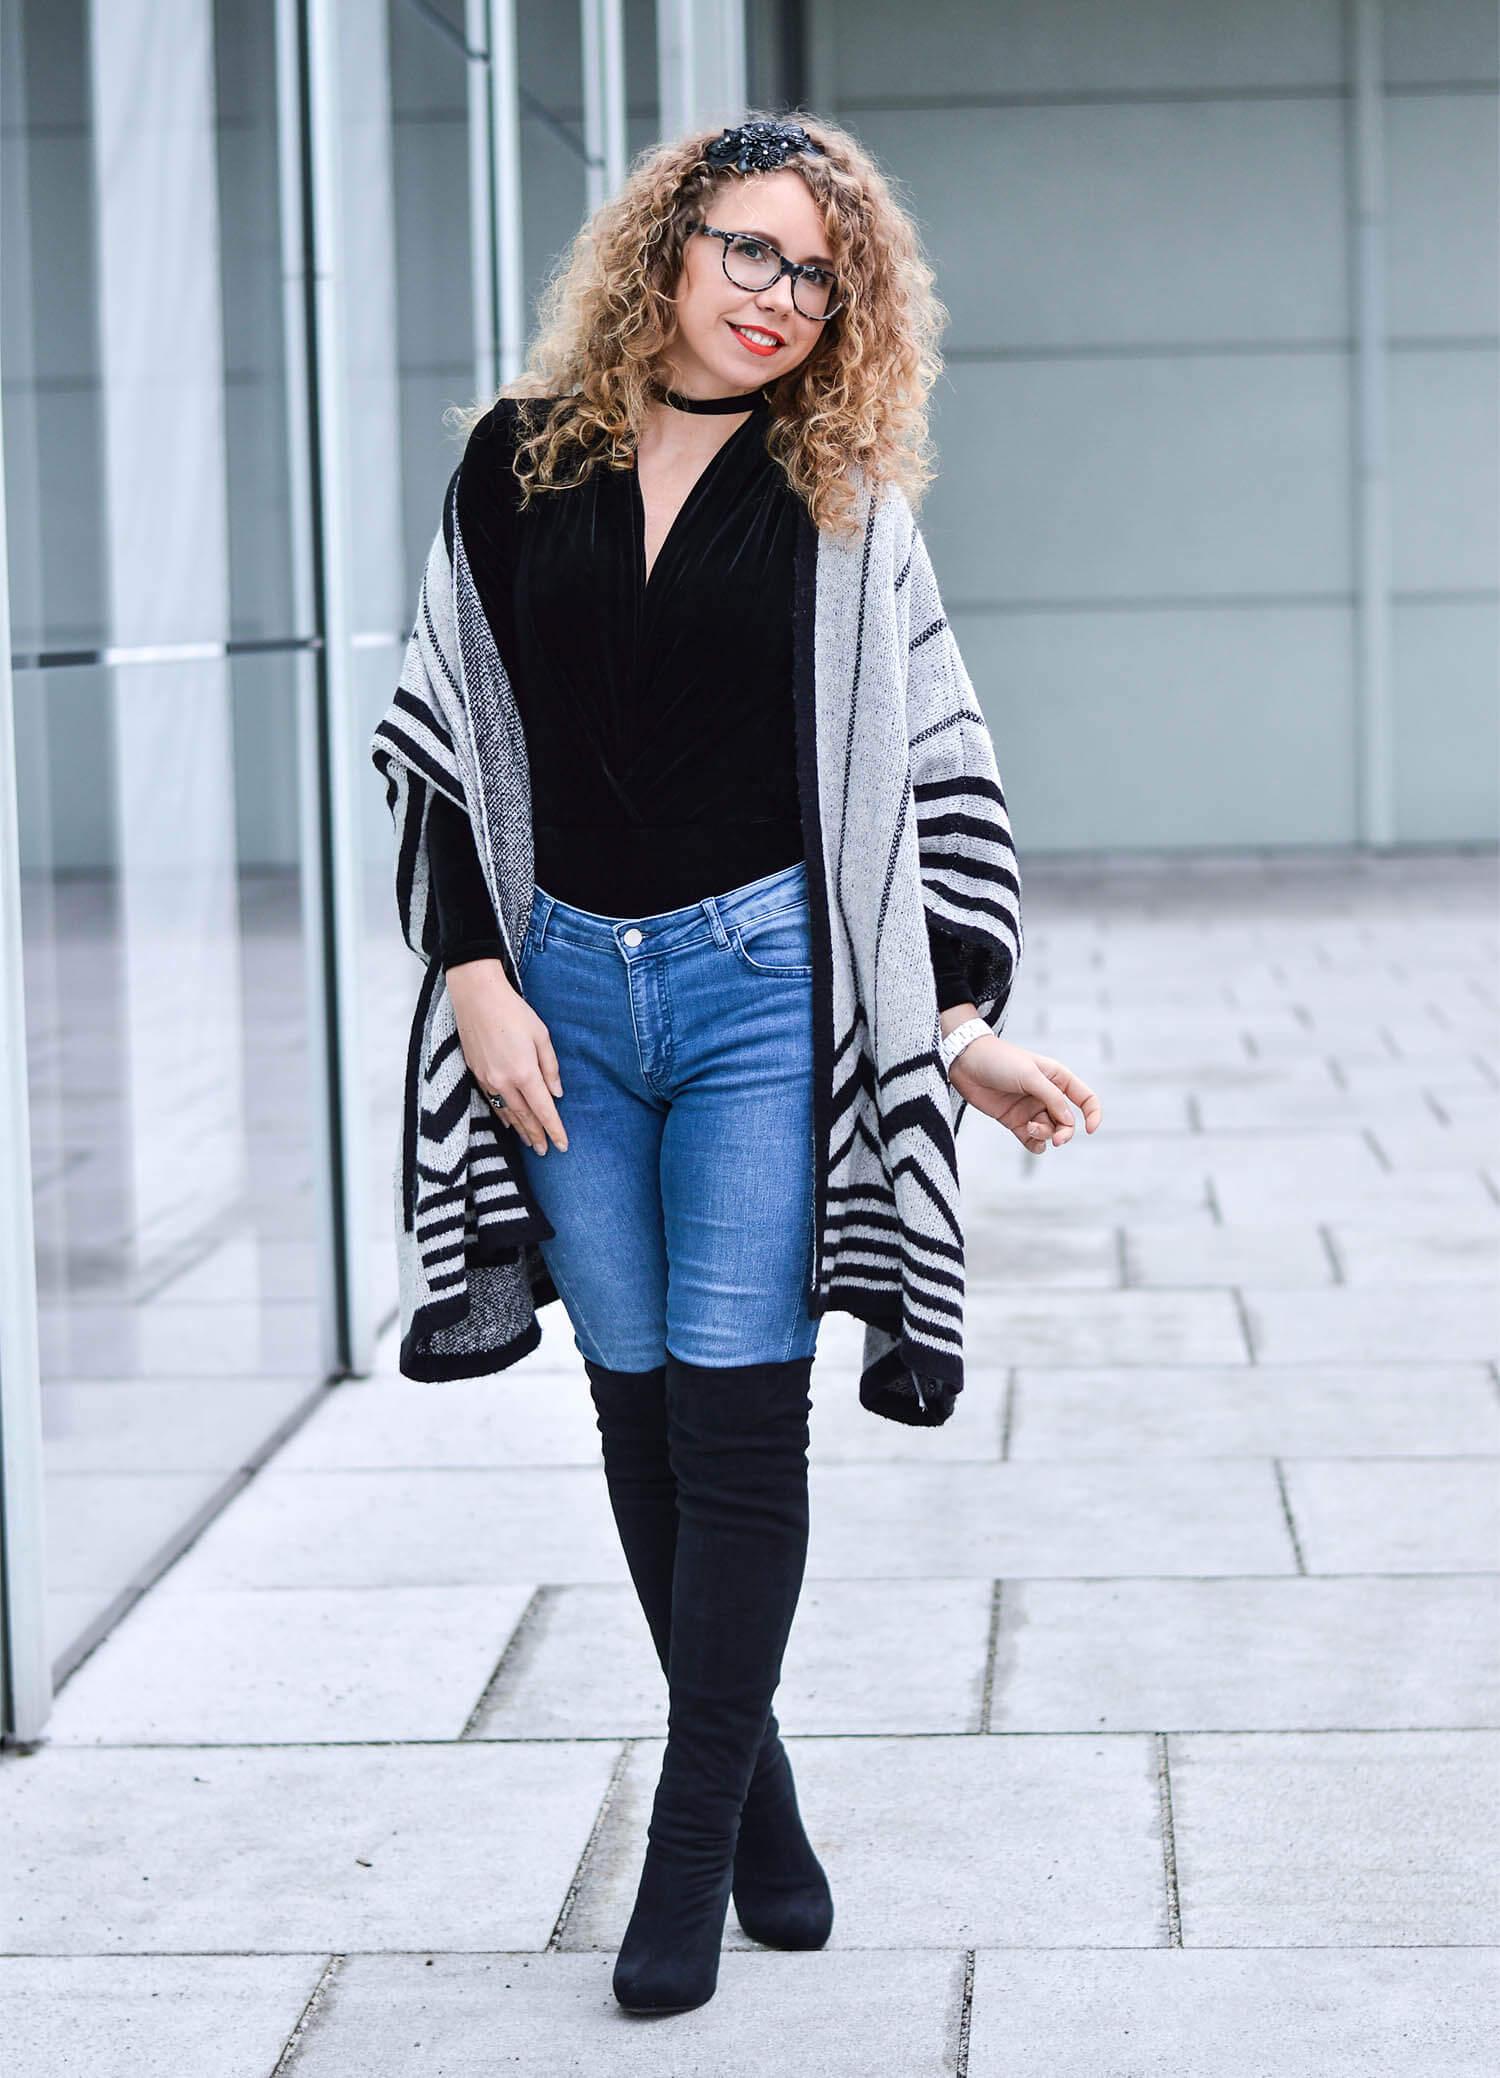 Kationette Fashionblog Outfit: Velvet Bodysuit, Overknees and Zara Cape Streetstyle Curls